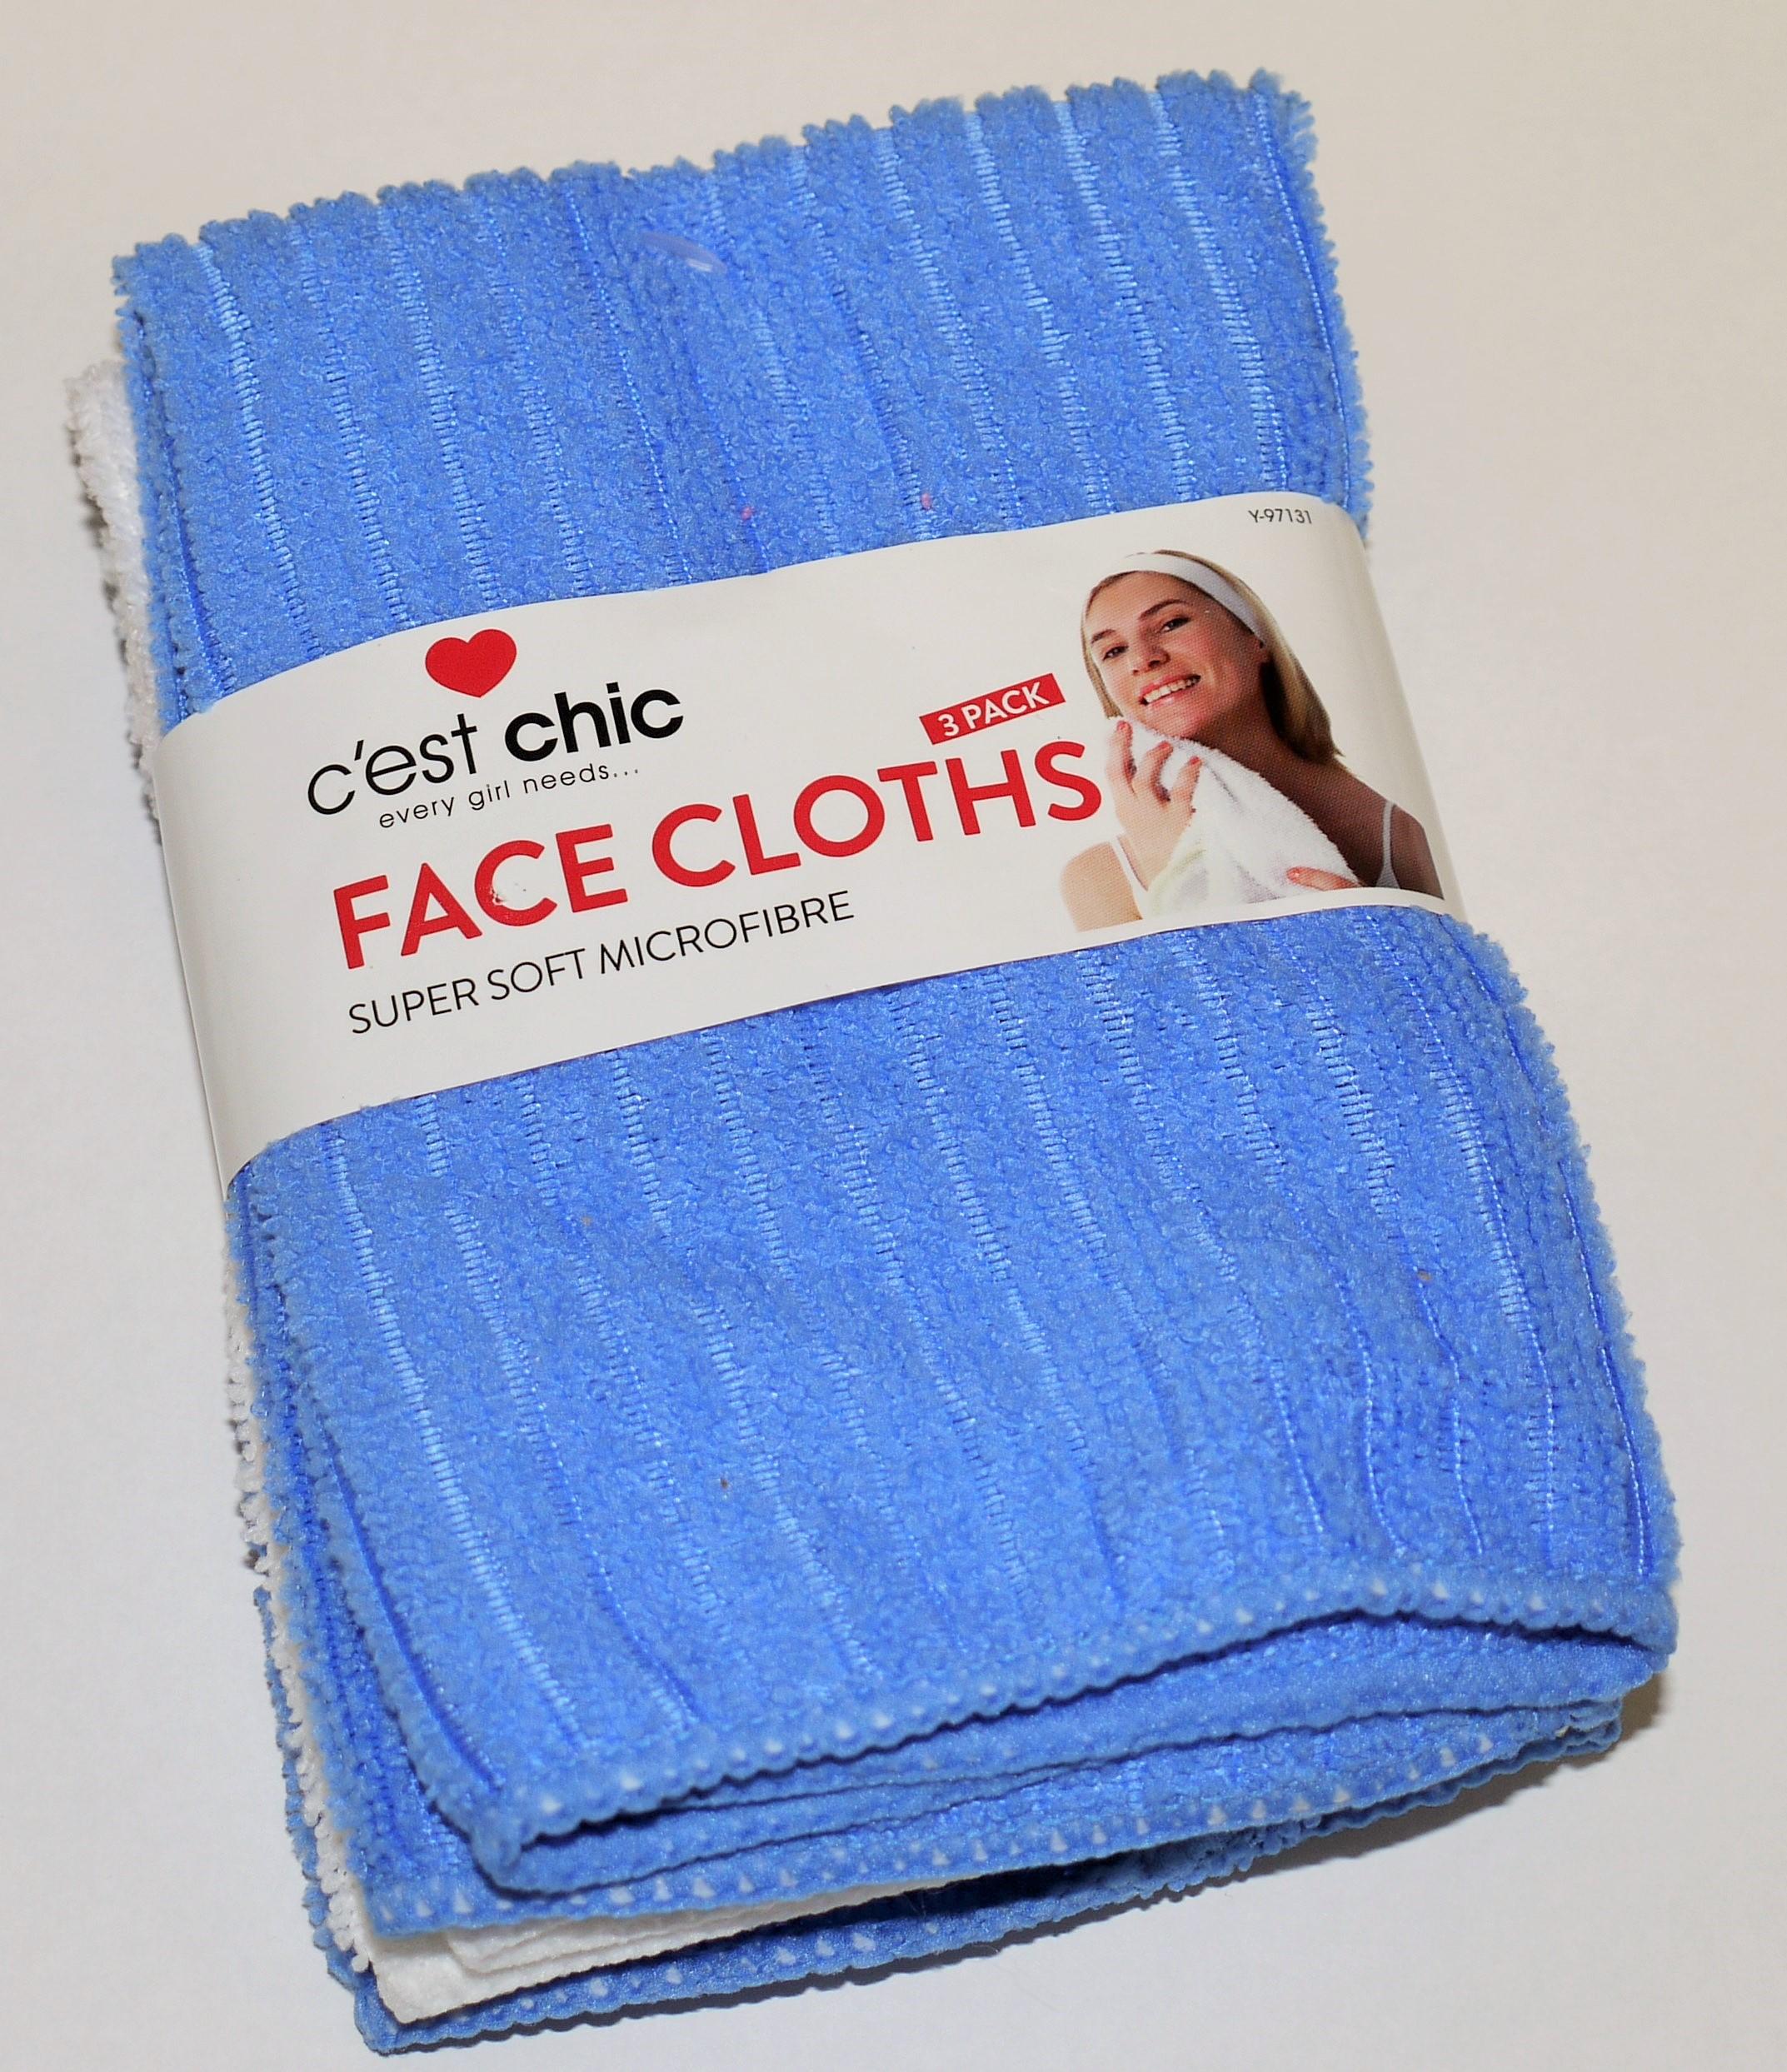 Wash Cloths As Burp Cloths: NEW SUPER SOFT MICROFIBRE FACE CLOTHS FACE TOWELS WASH